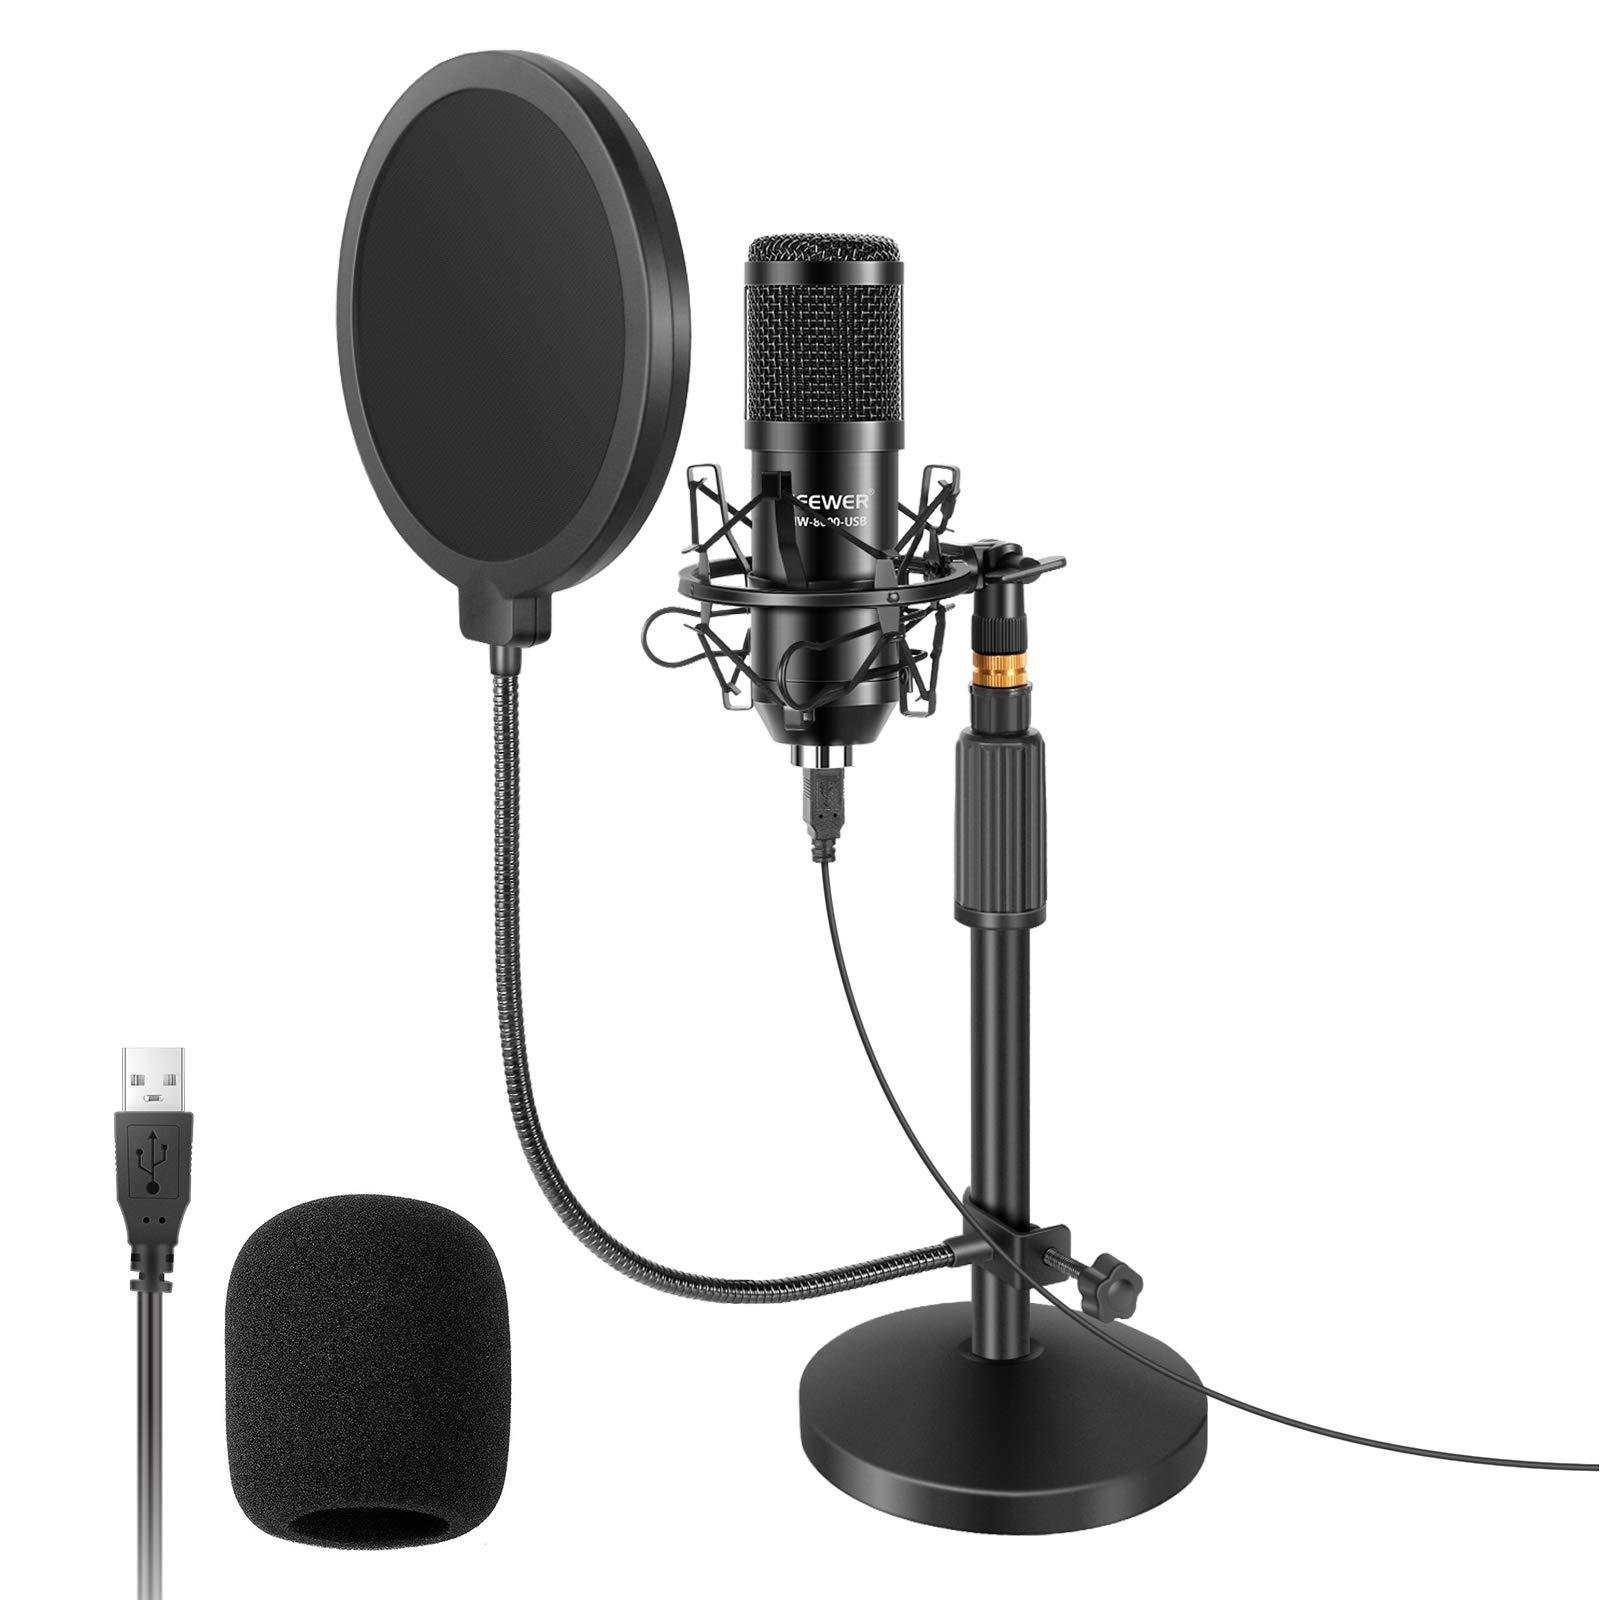 Microfono Neewer USB with Stand Kit - 192KHz/24Bit Plug&Play